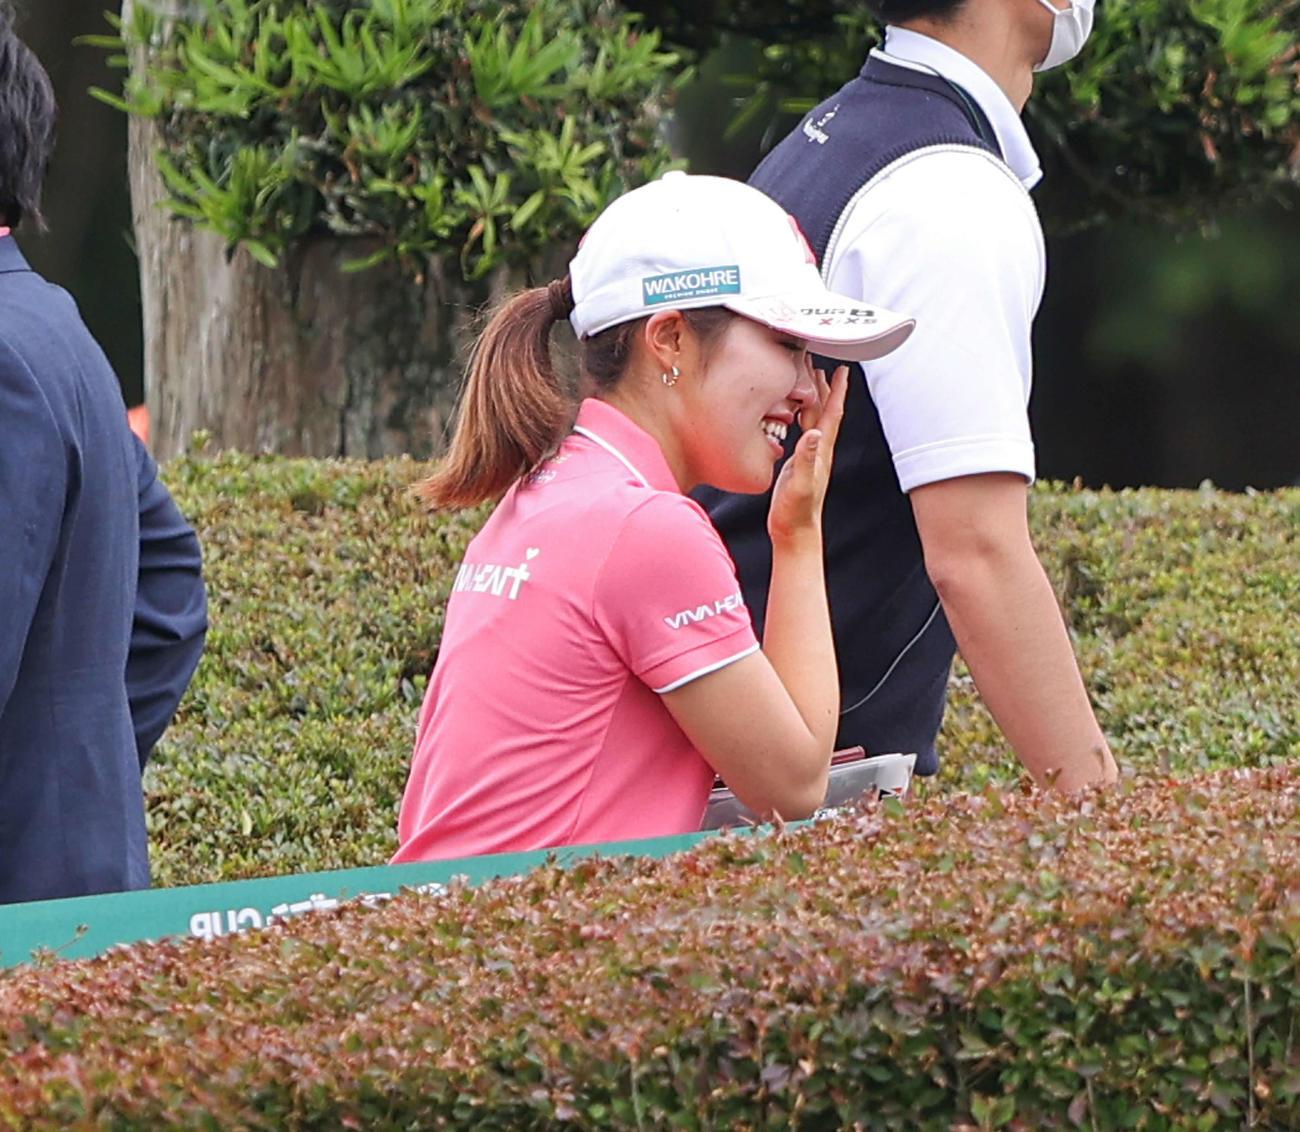 https://www.nikkansports.com/sports/golf/news/img/202106270000151-w1300_7.jpg